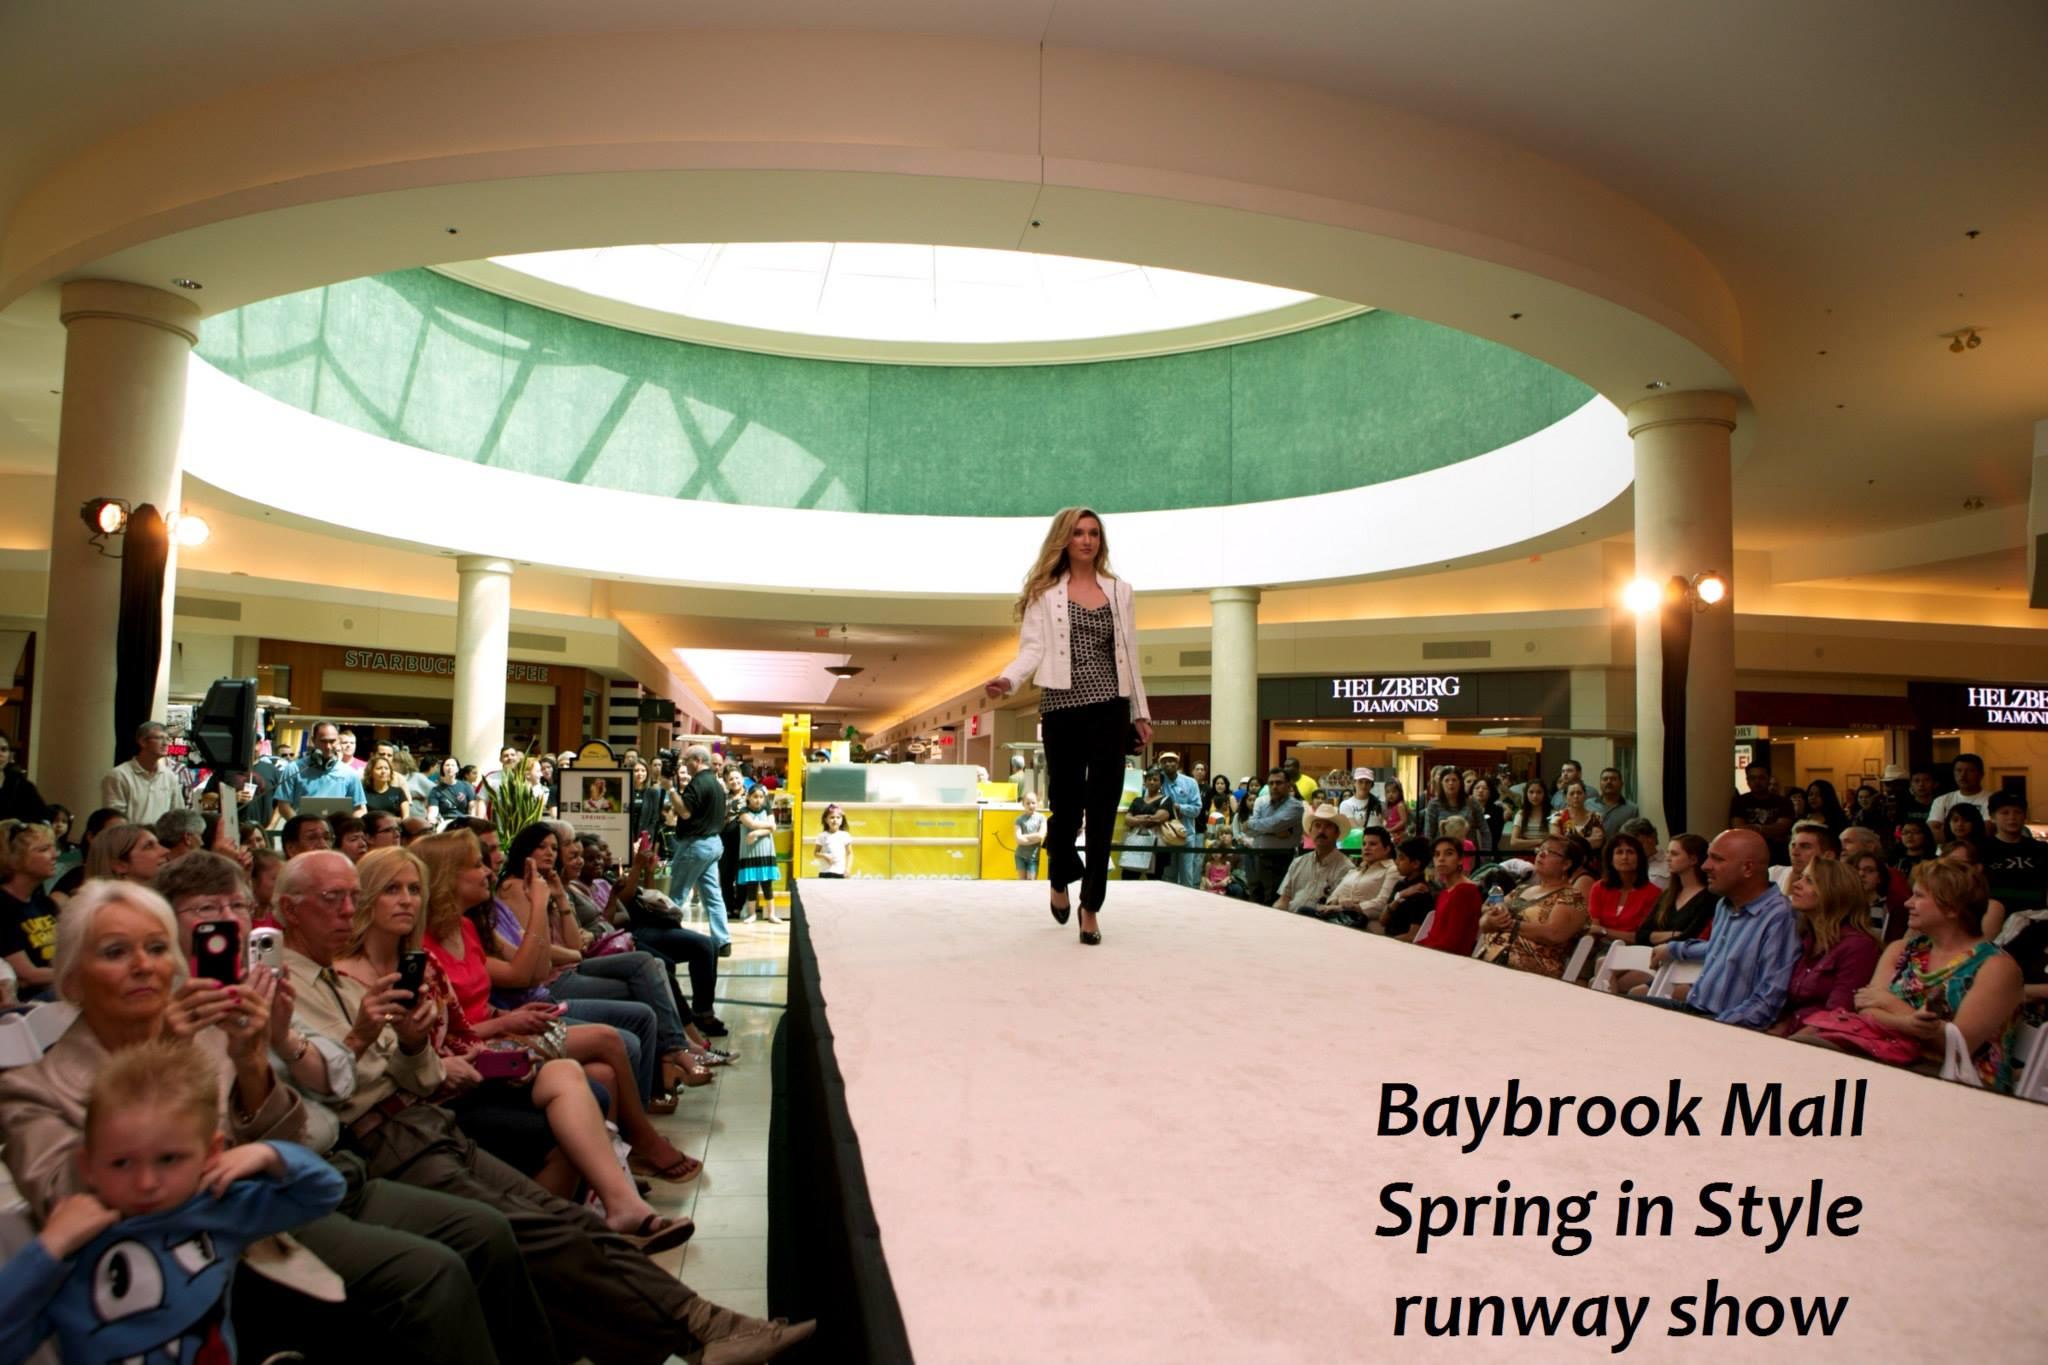 Baybrook Mall